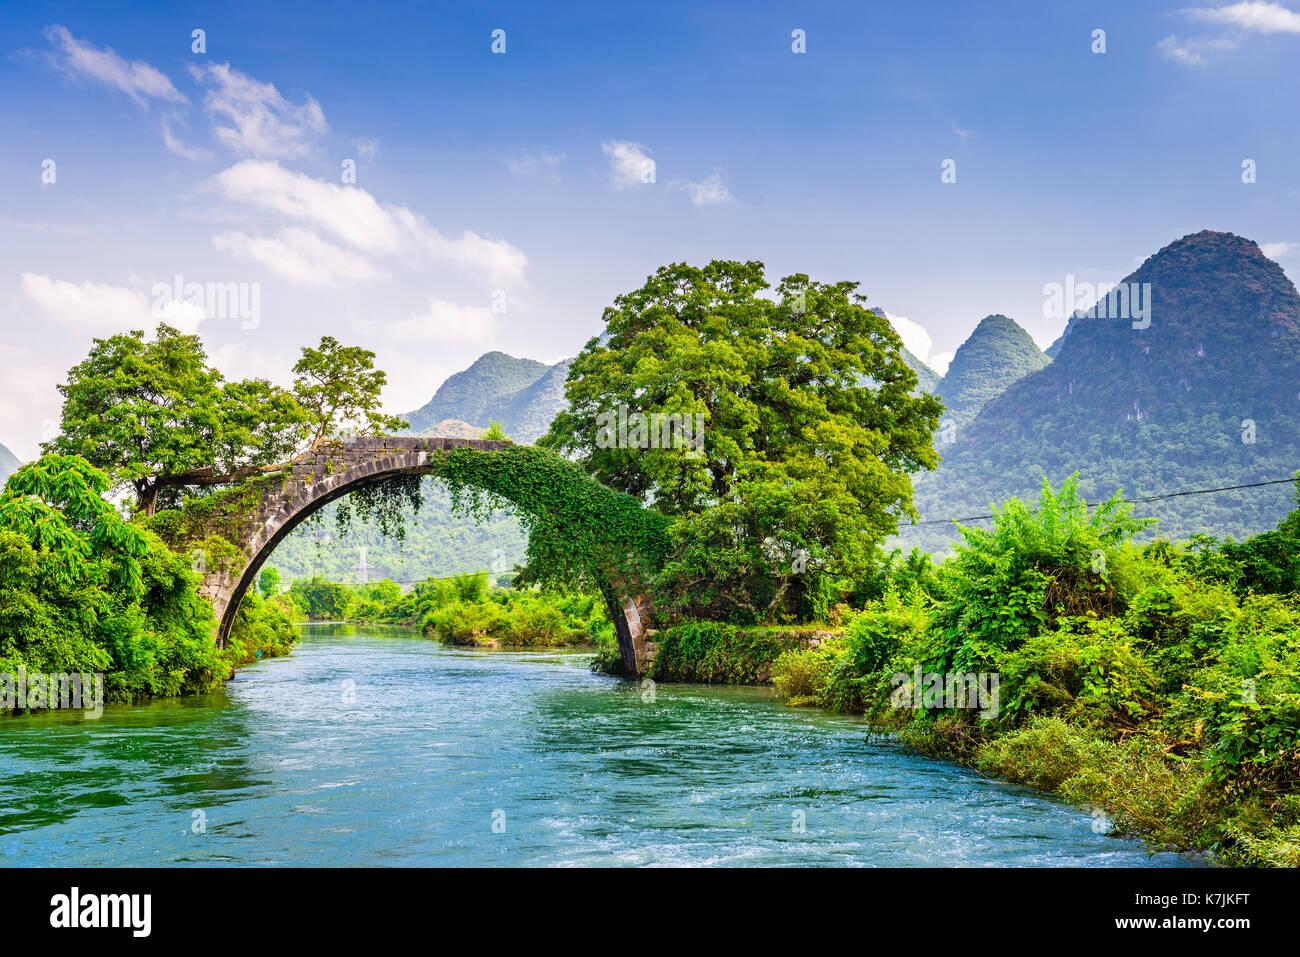 Yangshuo, China at the Dragon Bridge spanning the Li River. - Stock Image